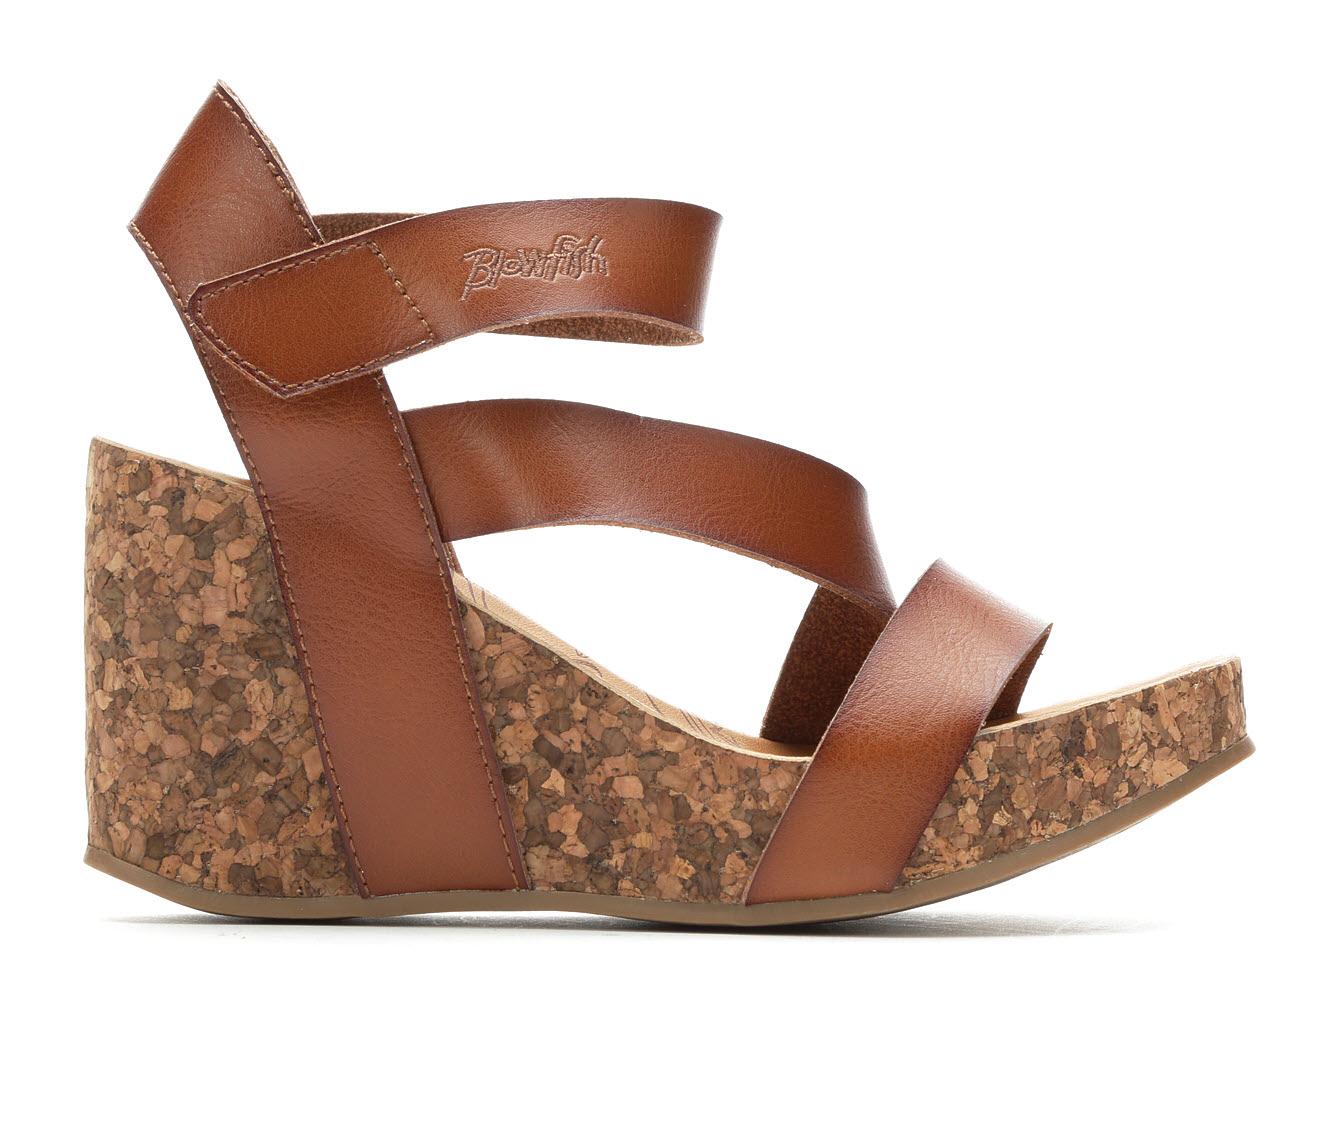 Blowfish Malibu Hapuku Women's Dress Shoe (Brown Faux Leather)